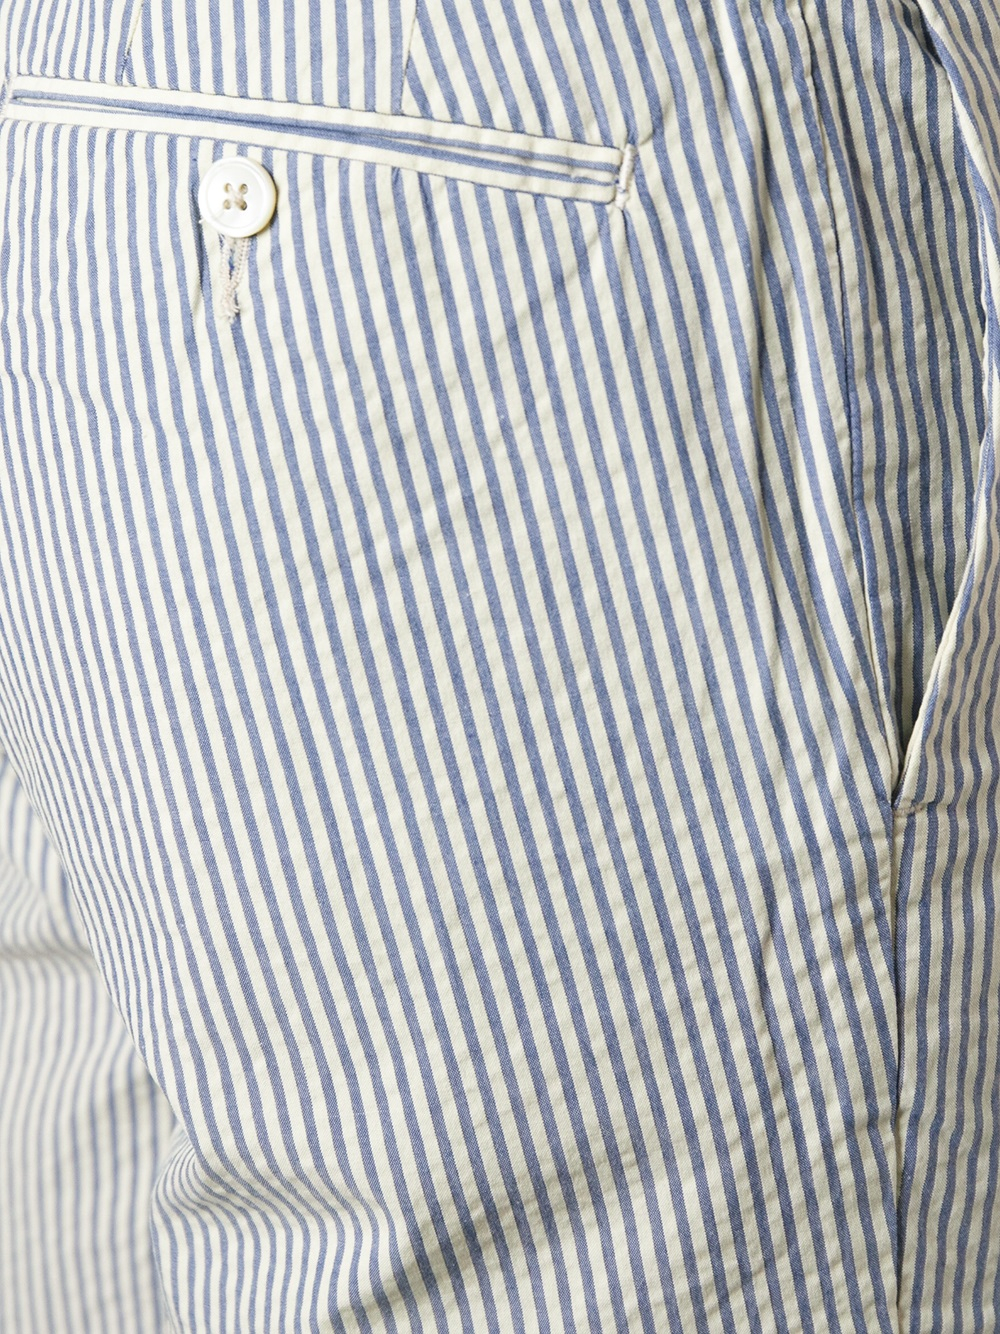 Polo ralph lauren Striped Shorts in Blue for Men | Lyst